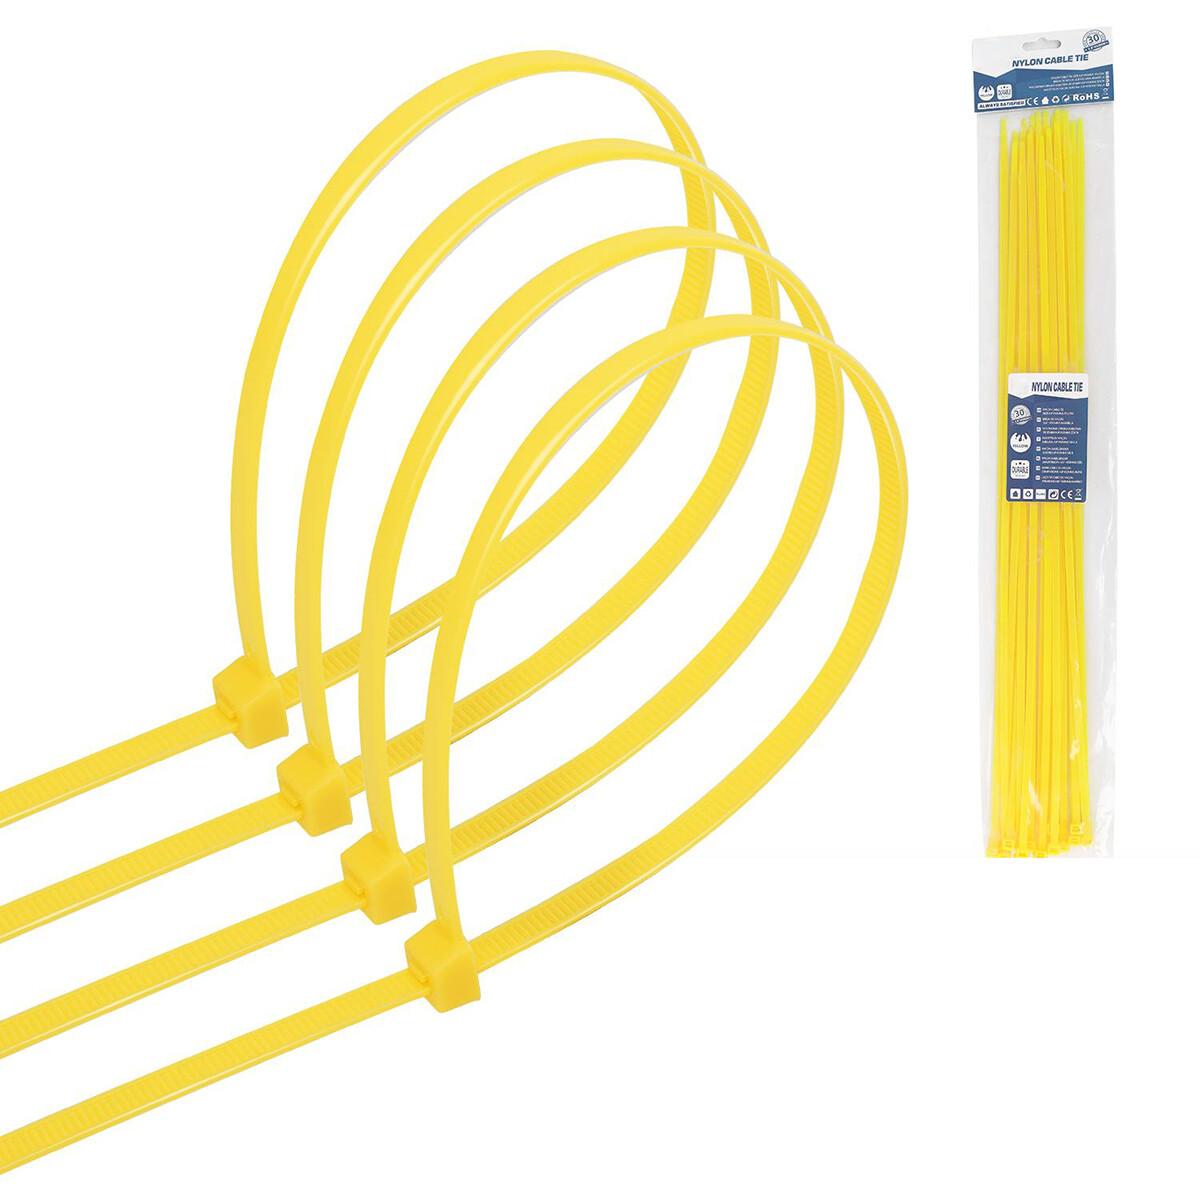 Tie Wraps - Tyrap - Aigi Tie - 4.8x450mm - Geel - 30 Stuks